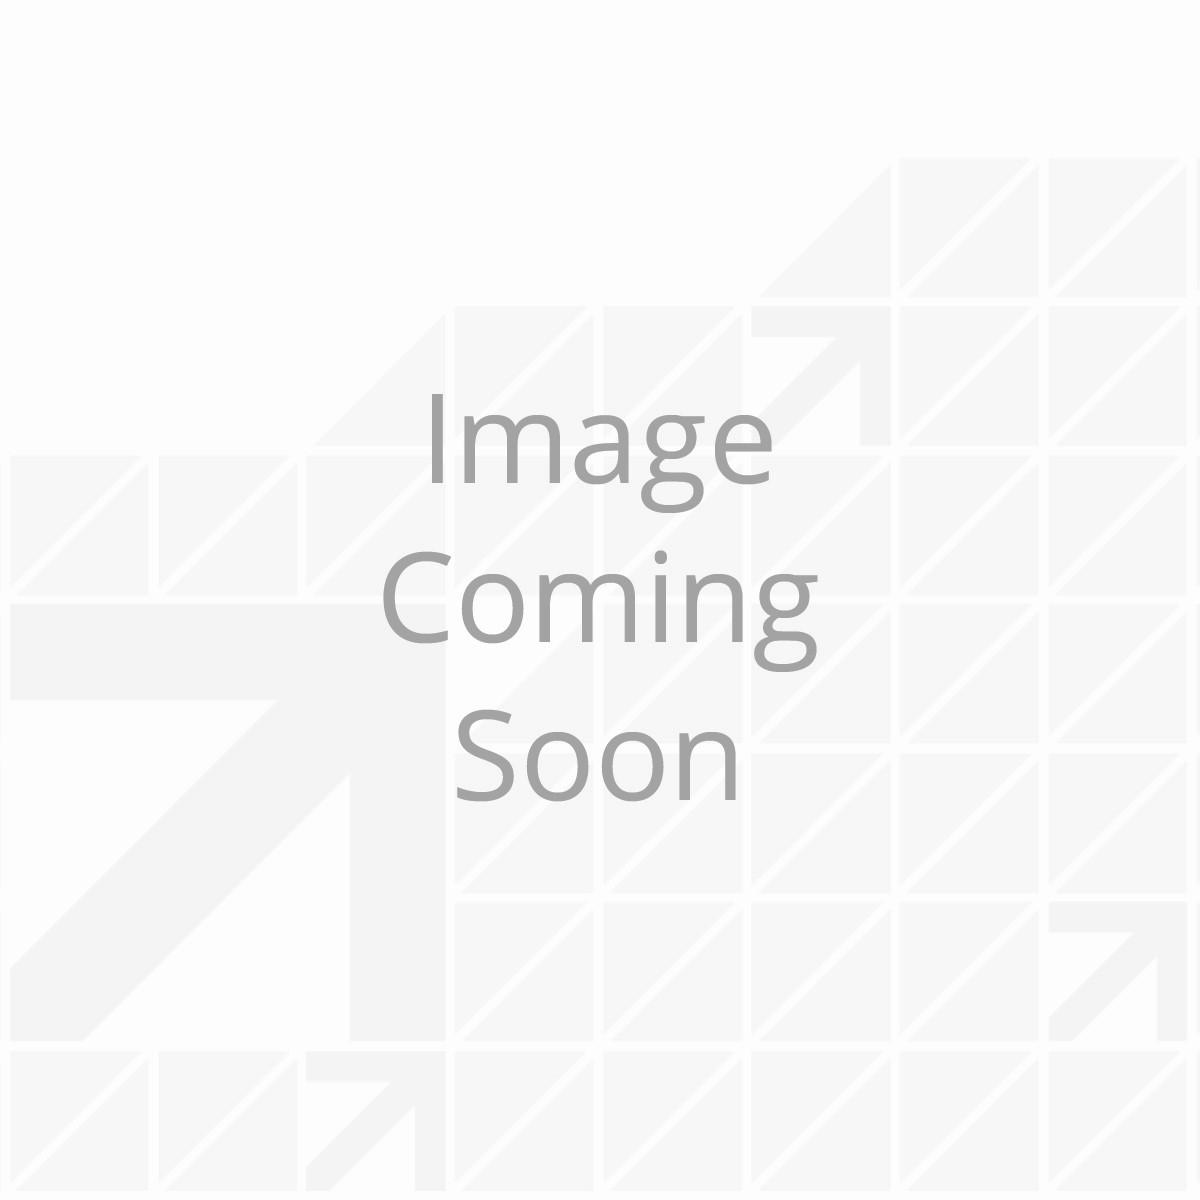 Toylok® Truck Tool Box Mounting Kit